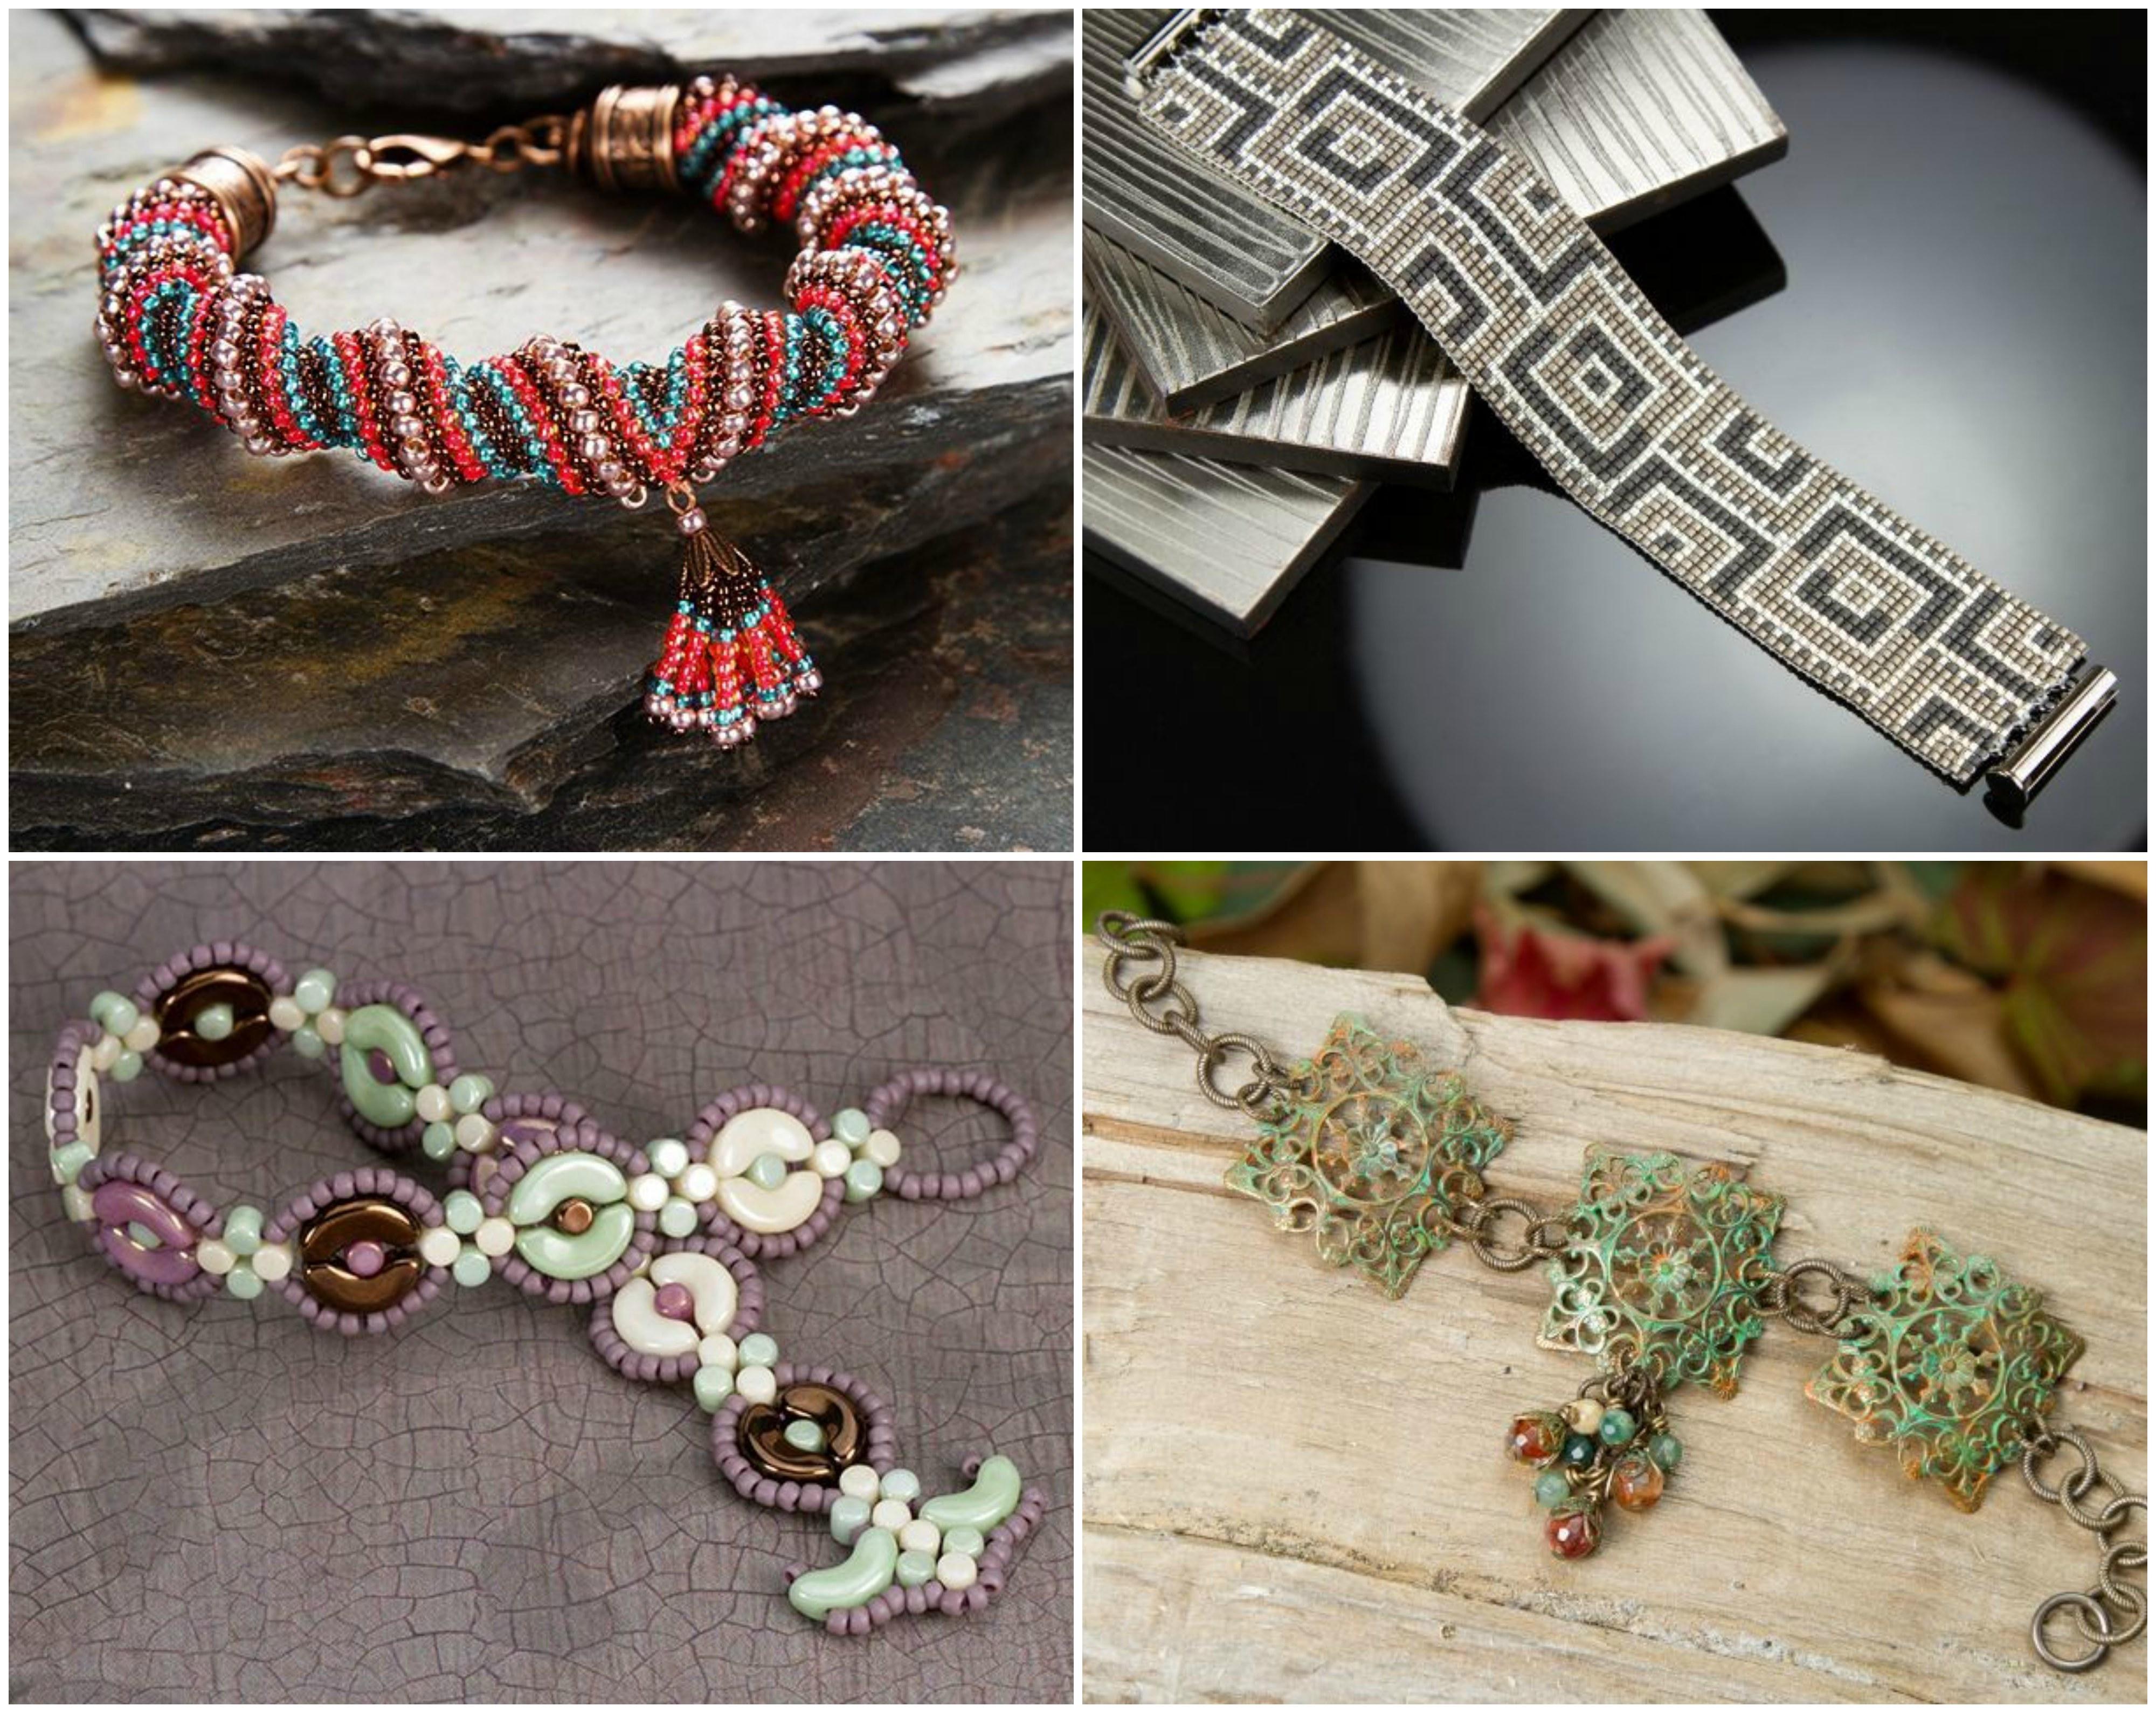 Artbeads designer Cheri Carlson's favorite bracelet designs.